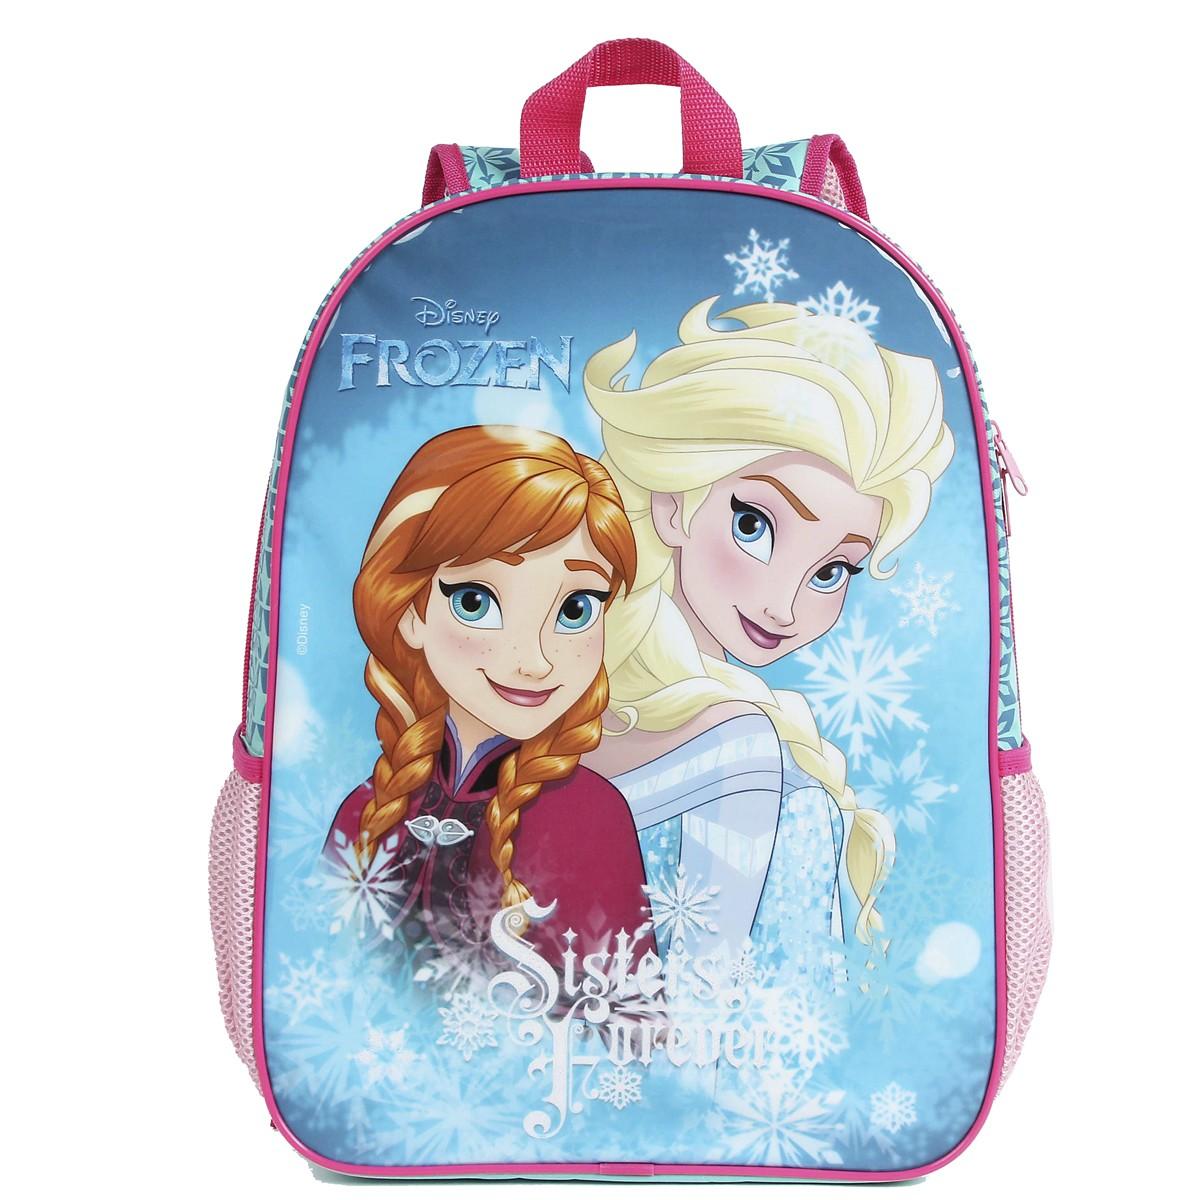 Mochila Escolar Frozen Sisters Forever | Cor: Verde àgua